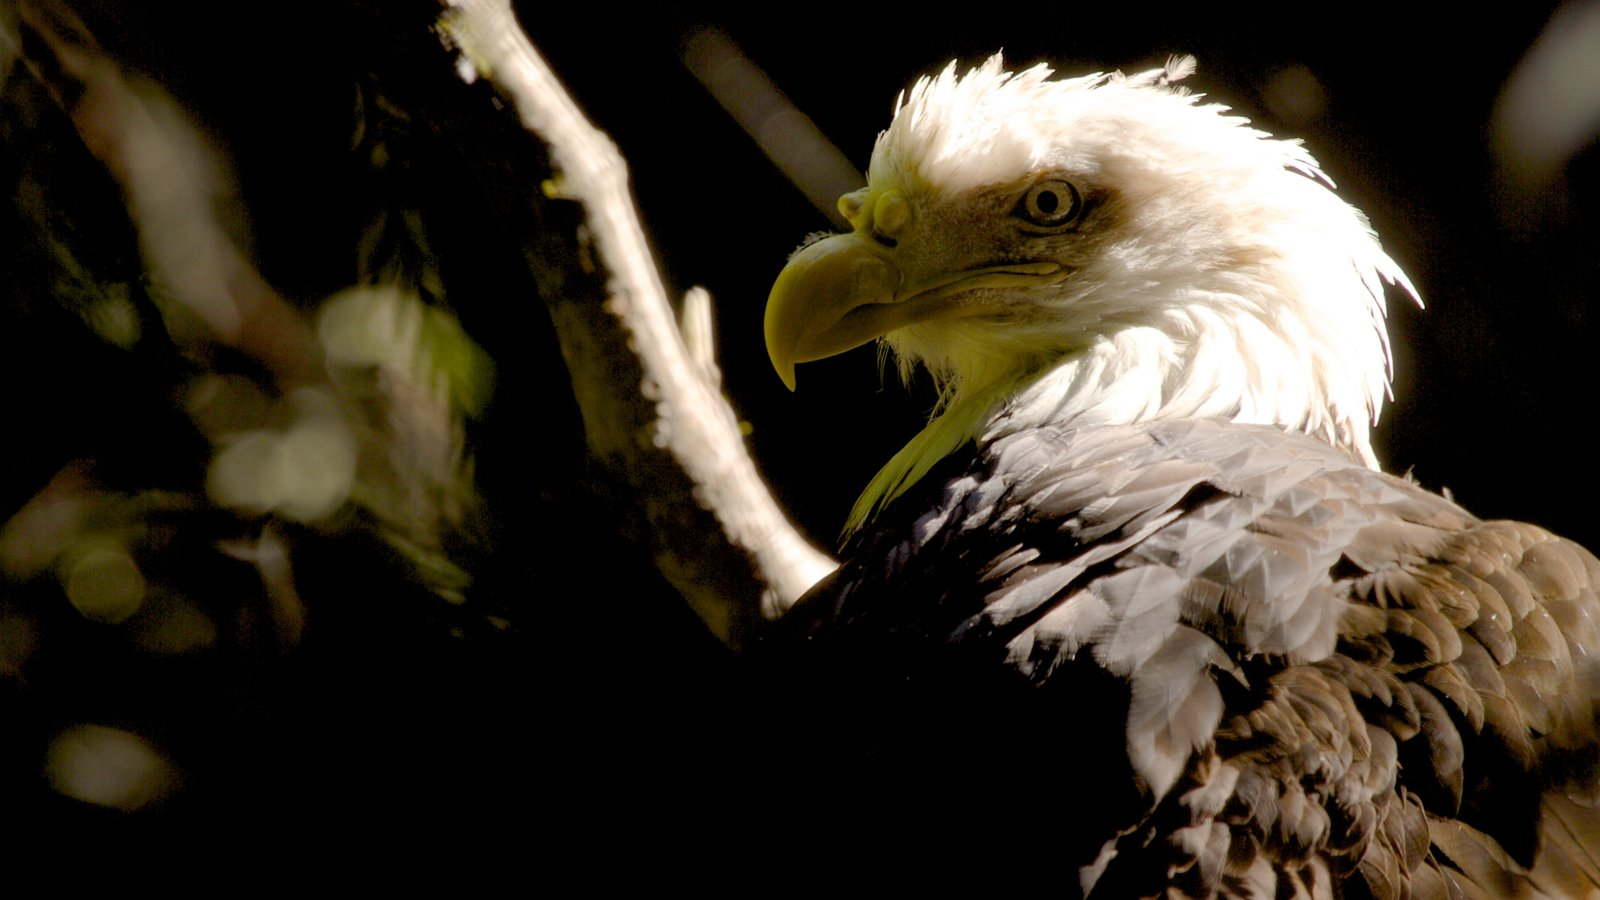 Oregon Zoo featuring bird life and zoo animals